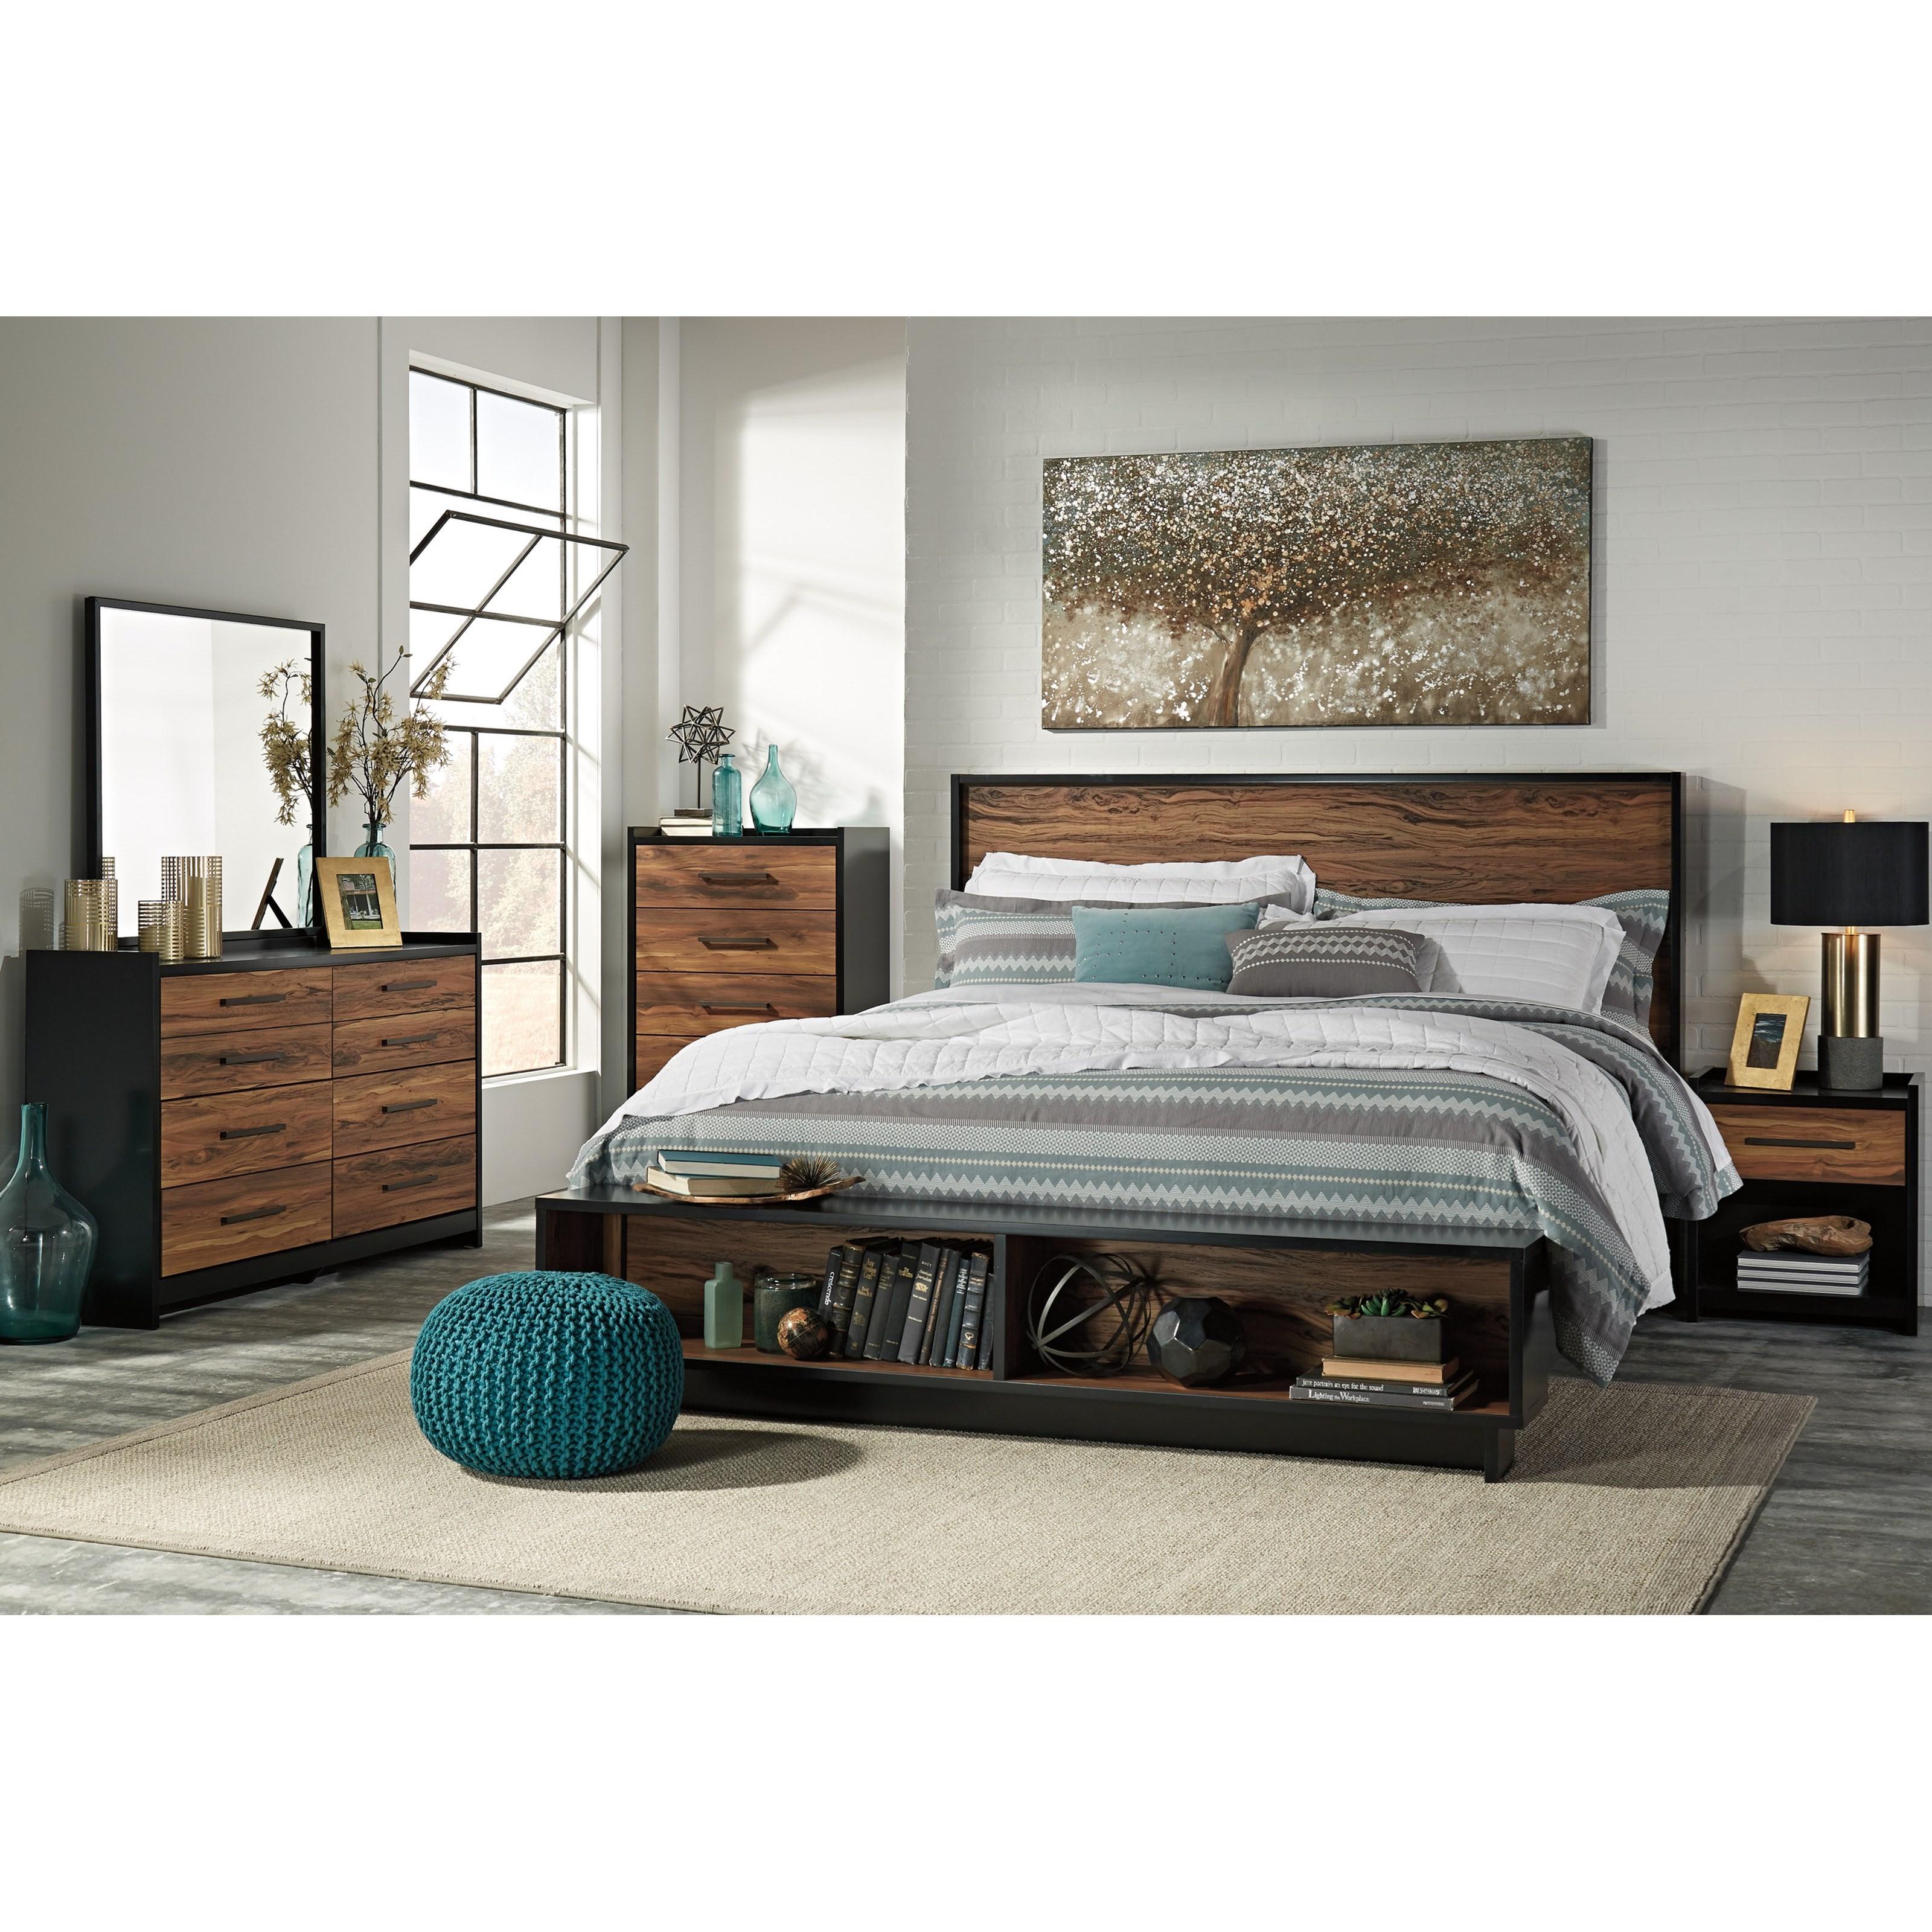 Signature Design By Ashley Stavani King Platform Bed W Storage Bench Footboard Olinde 39 S